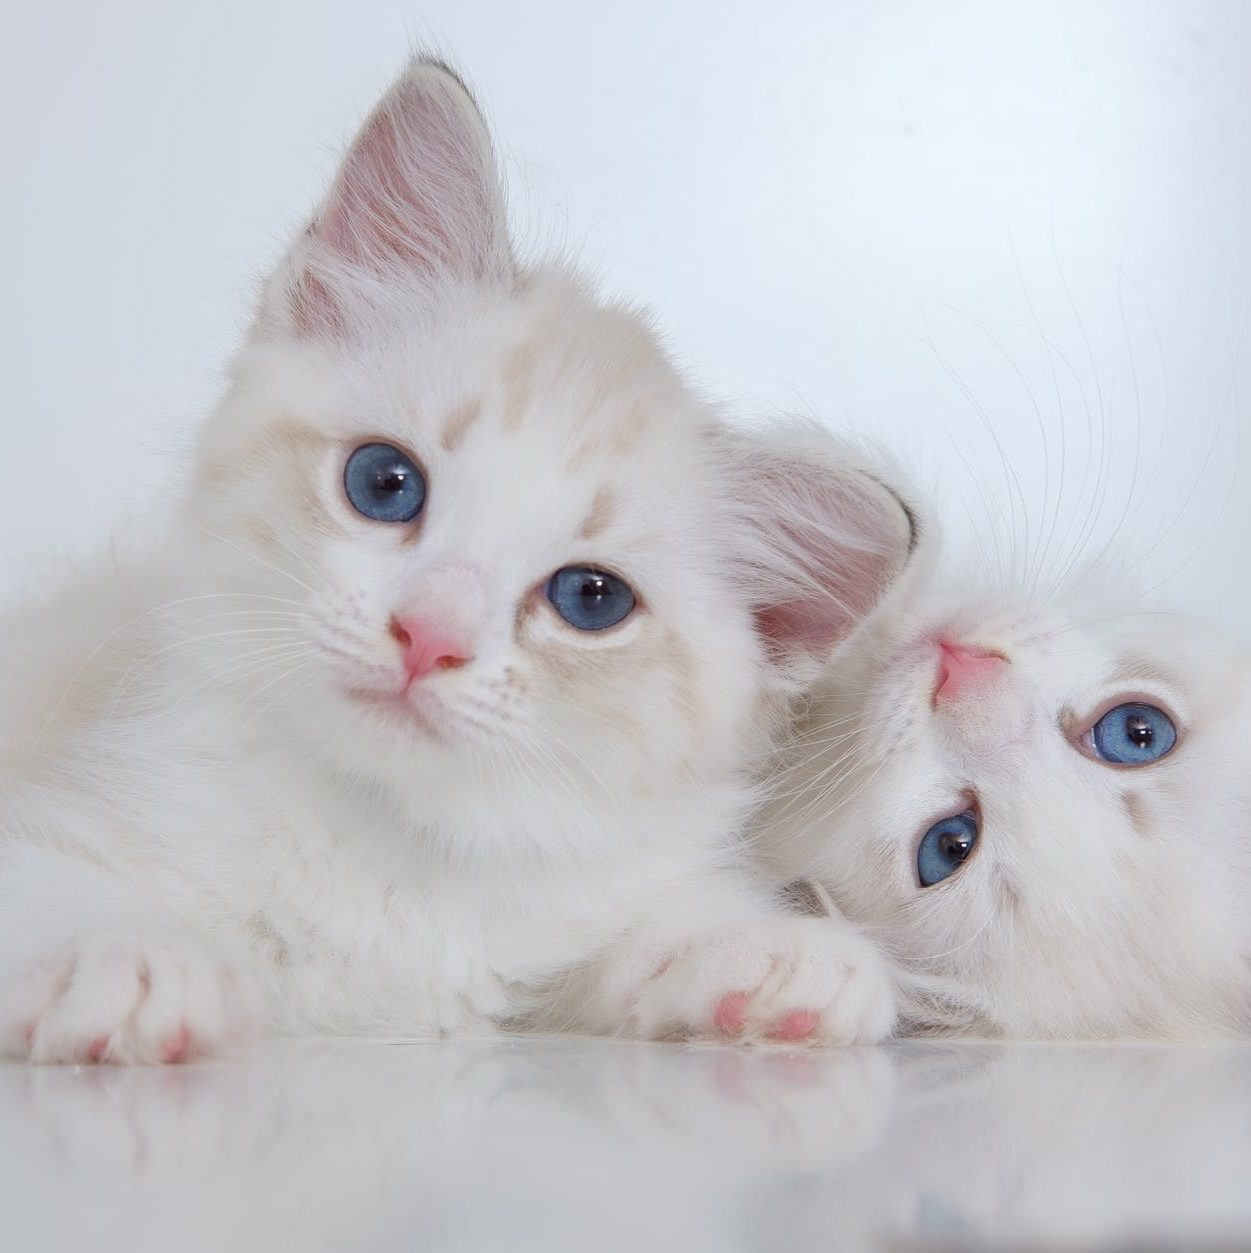 adorable kittens looking at camera